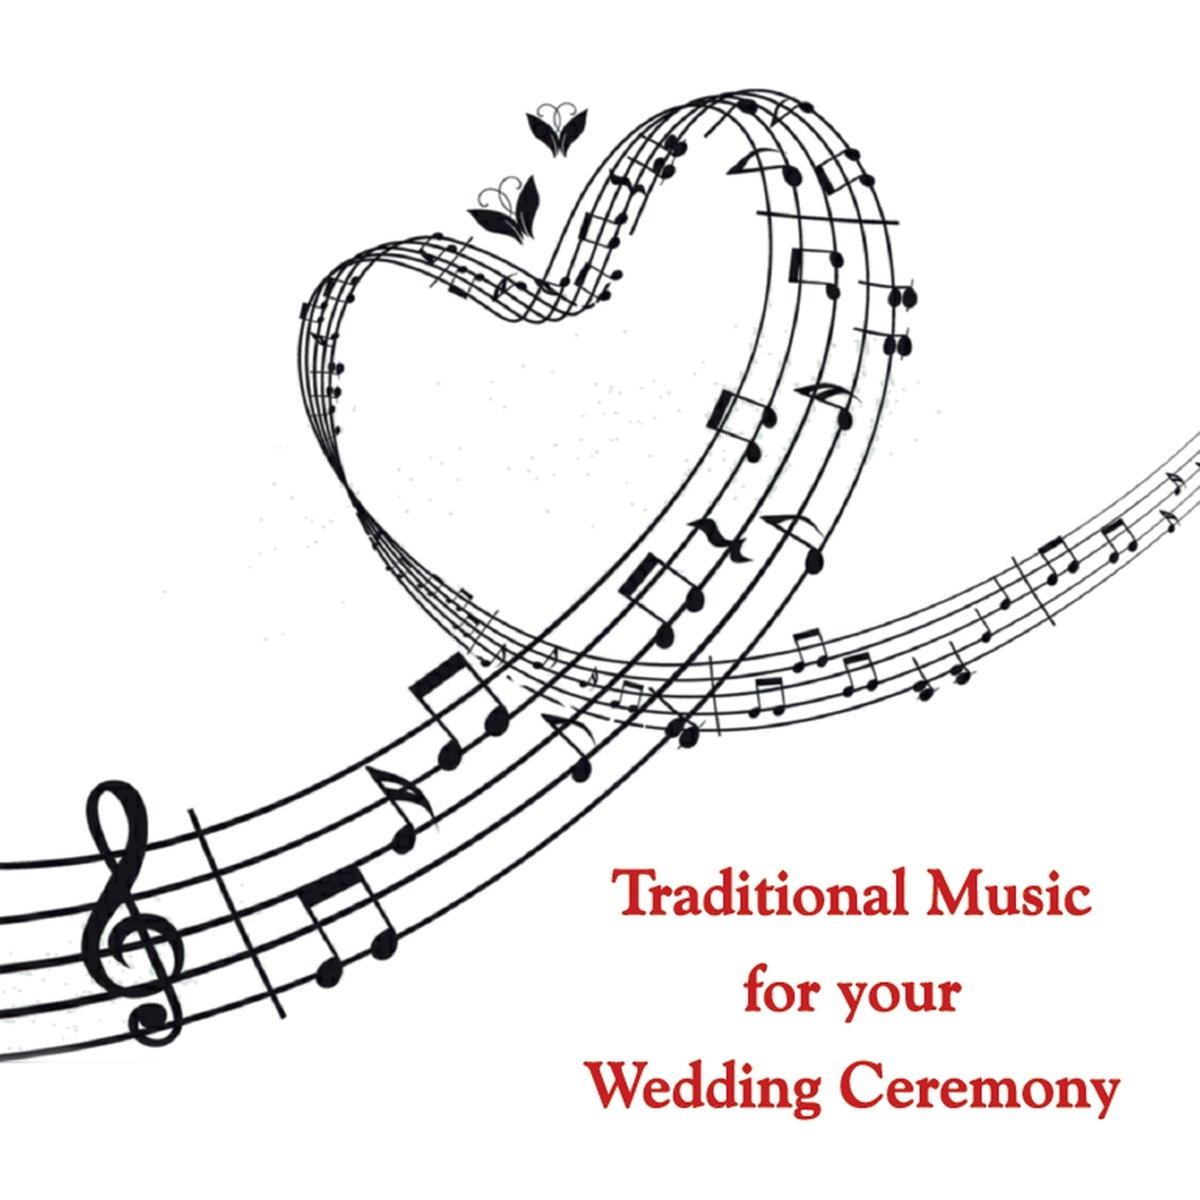 For Weddings